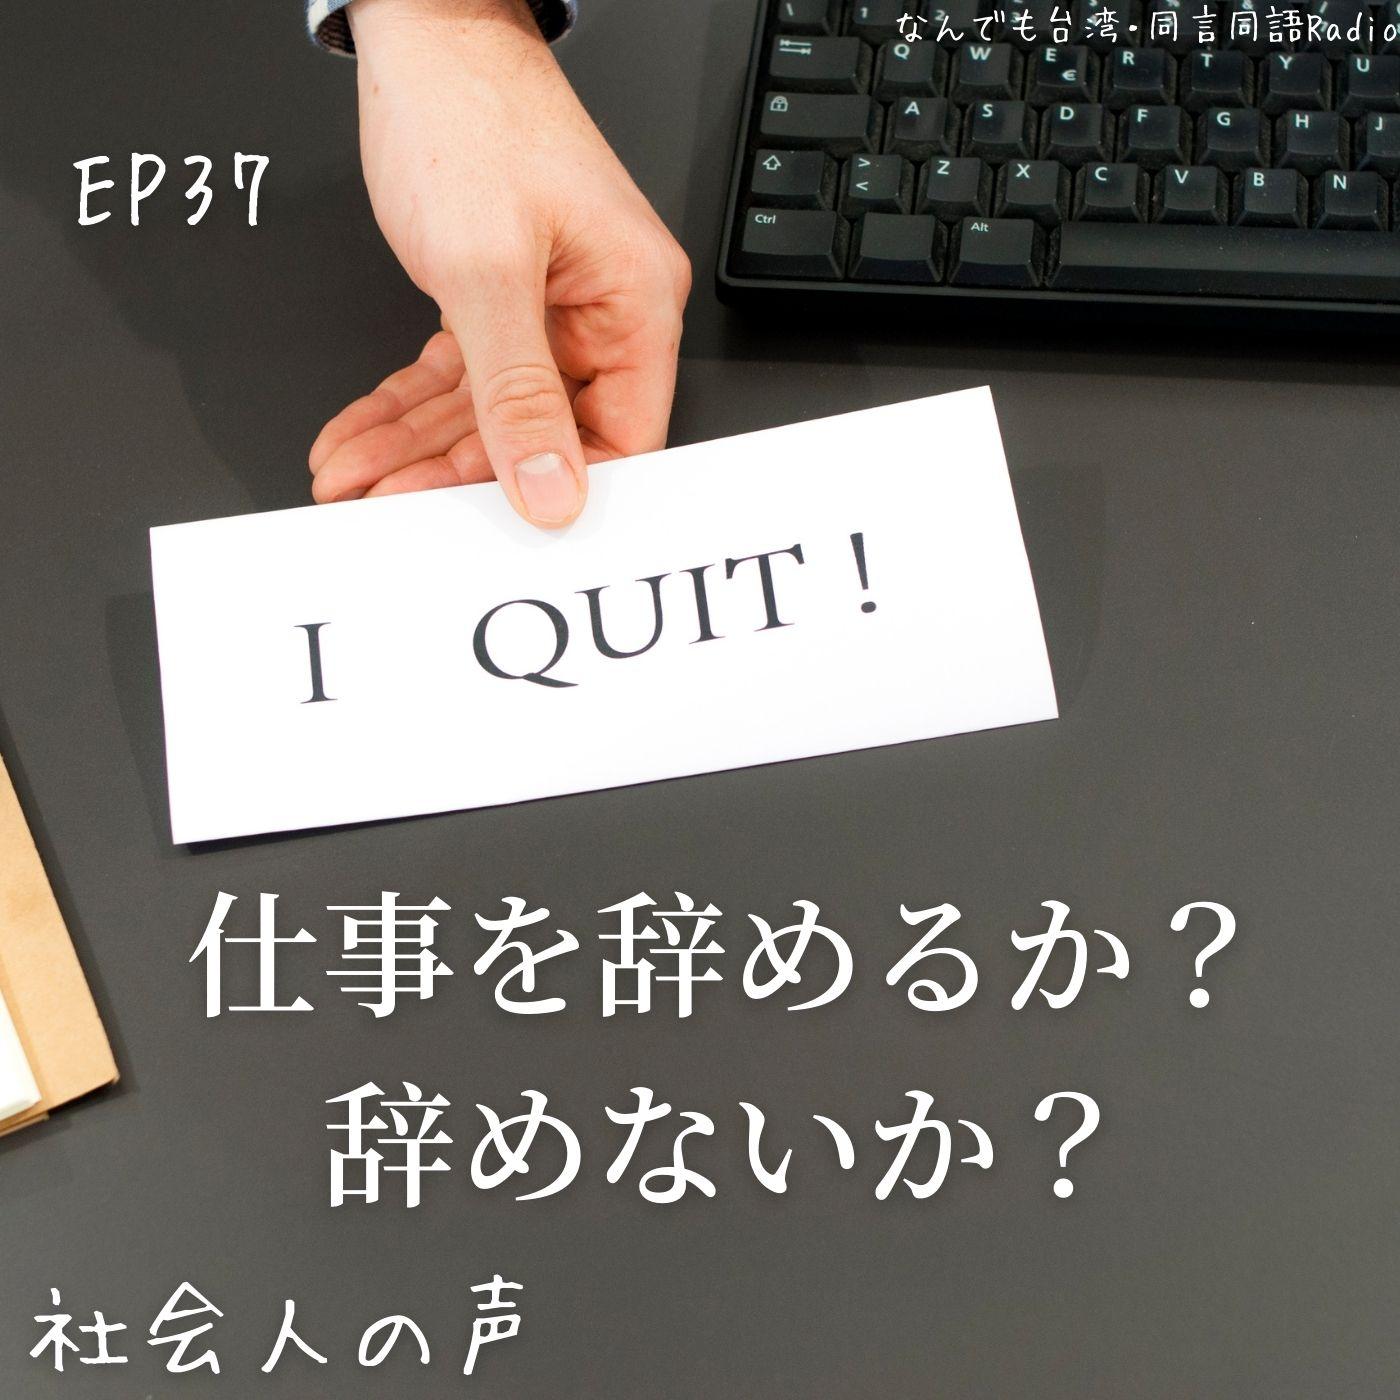 EP37 - (JP)【社会人の声】仕事を辞めるか?辞めないか?